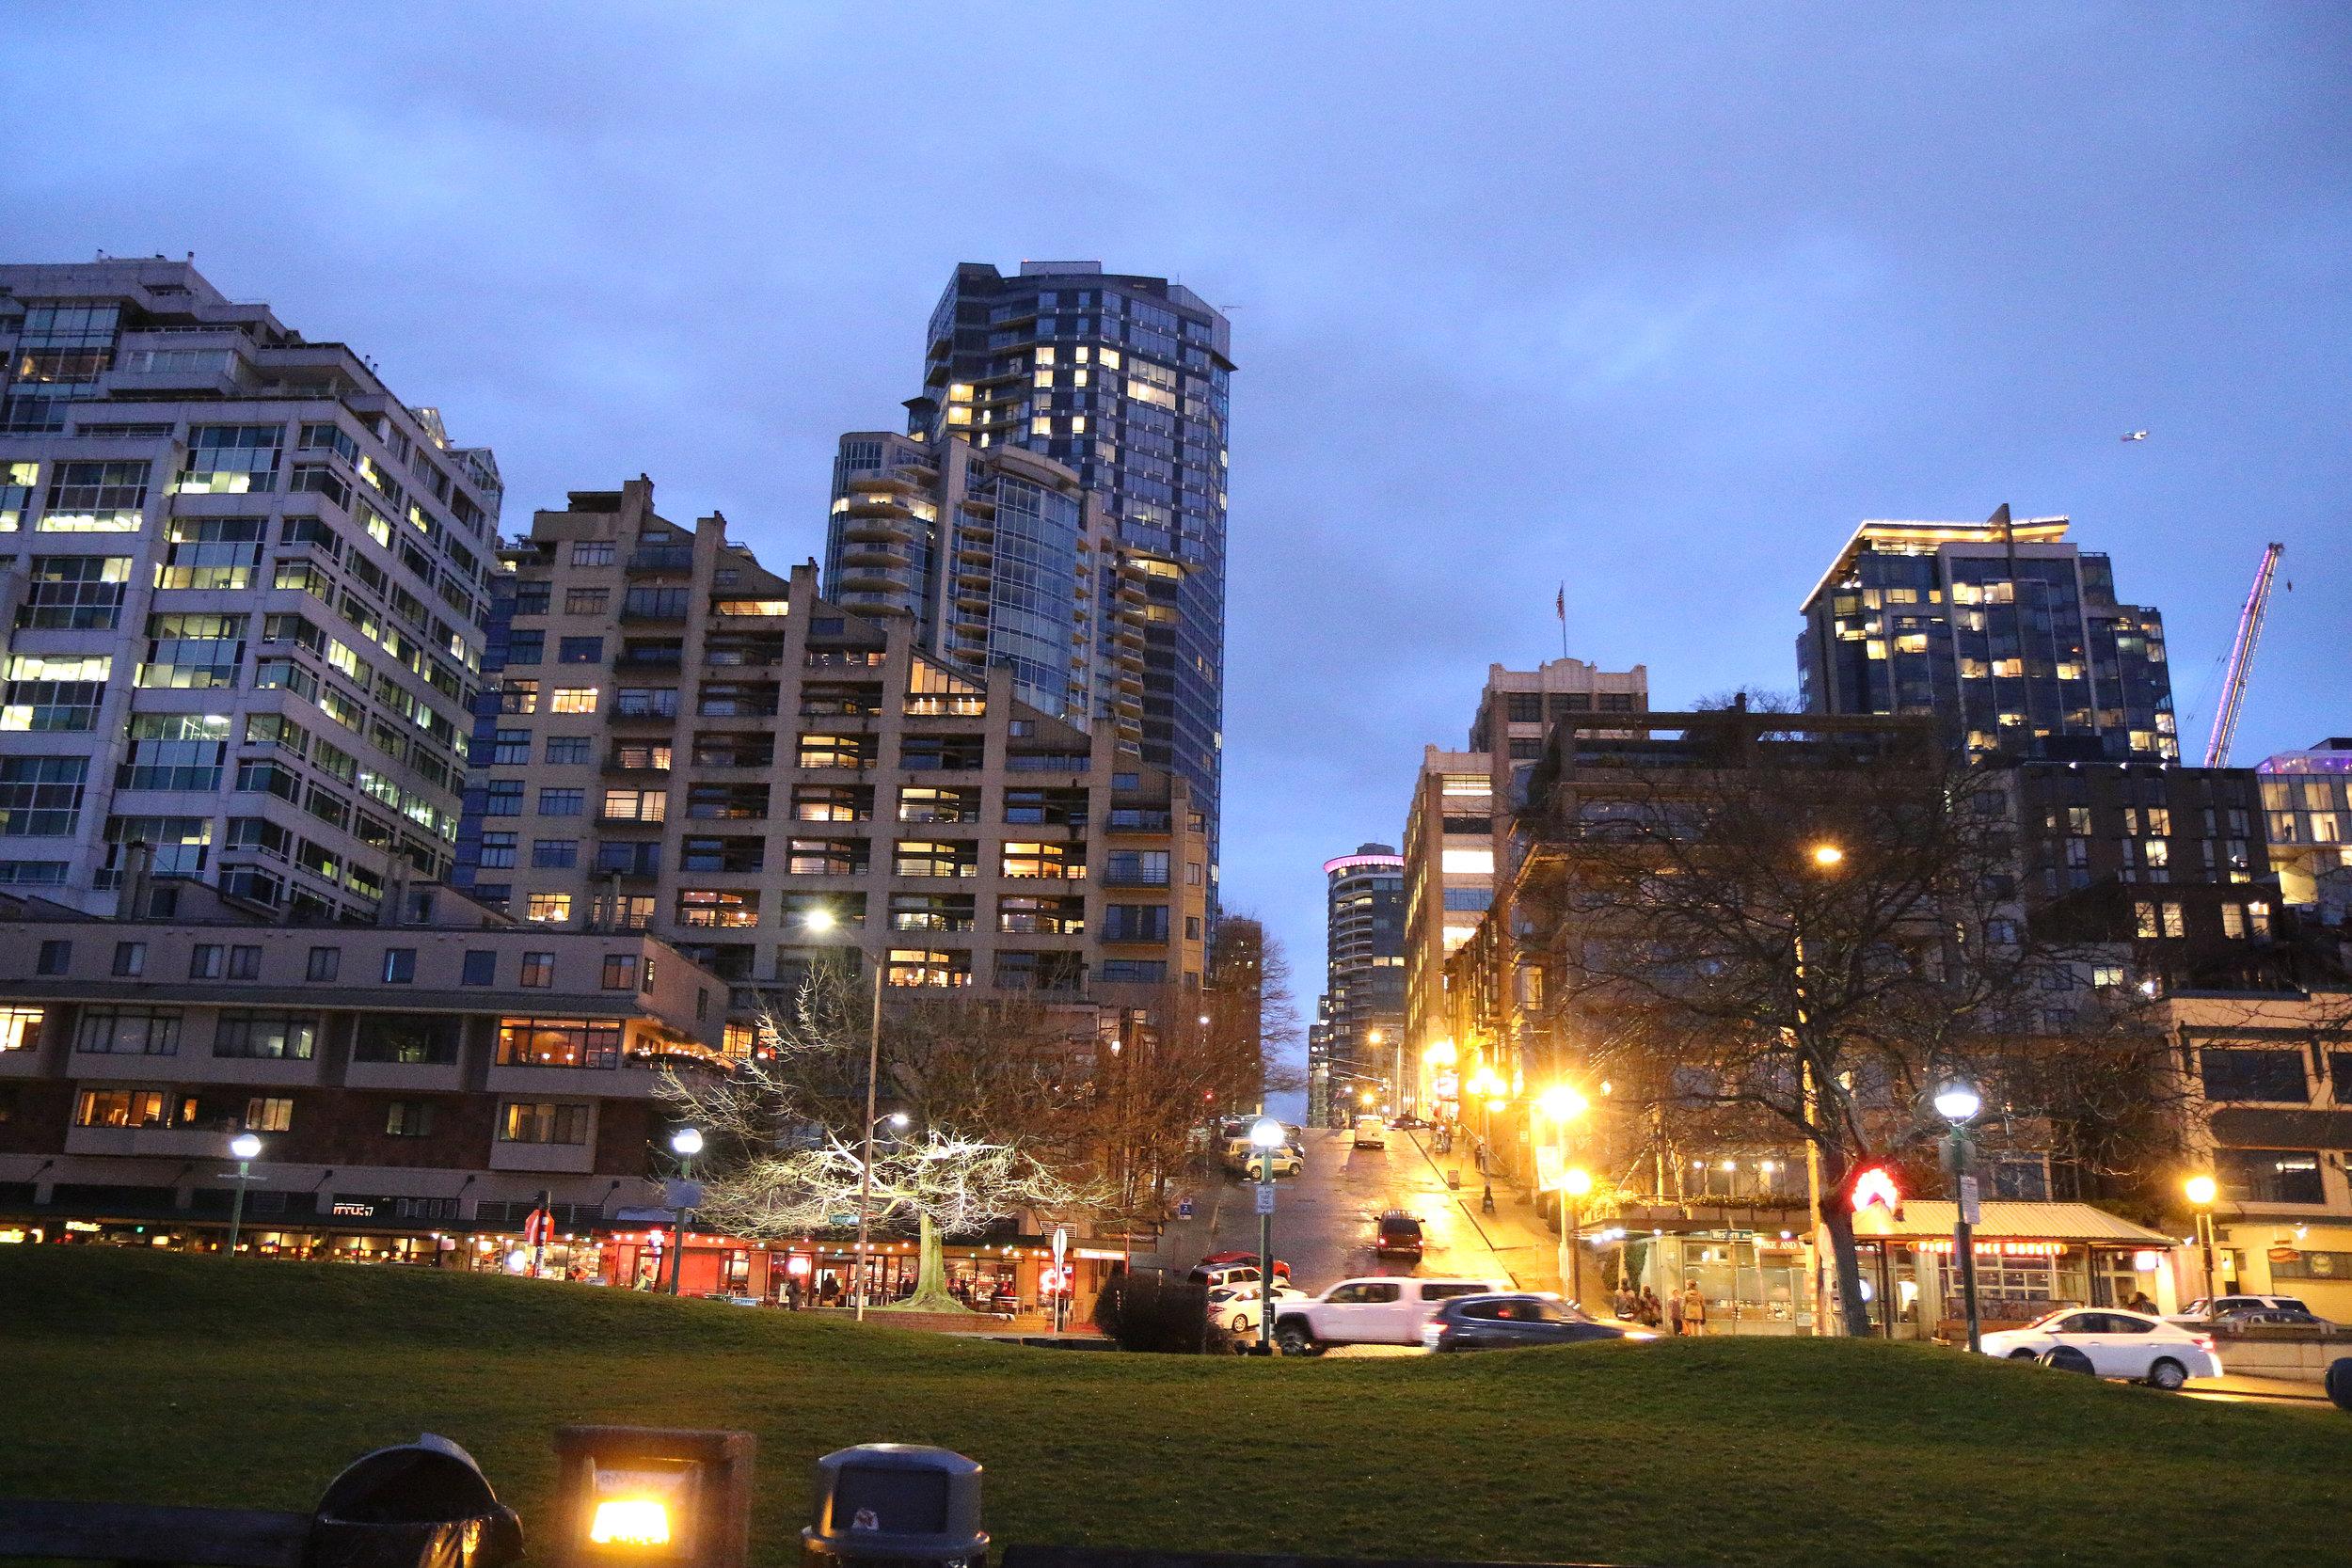 Downtown Seattle, Washington at night.